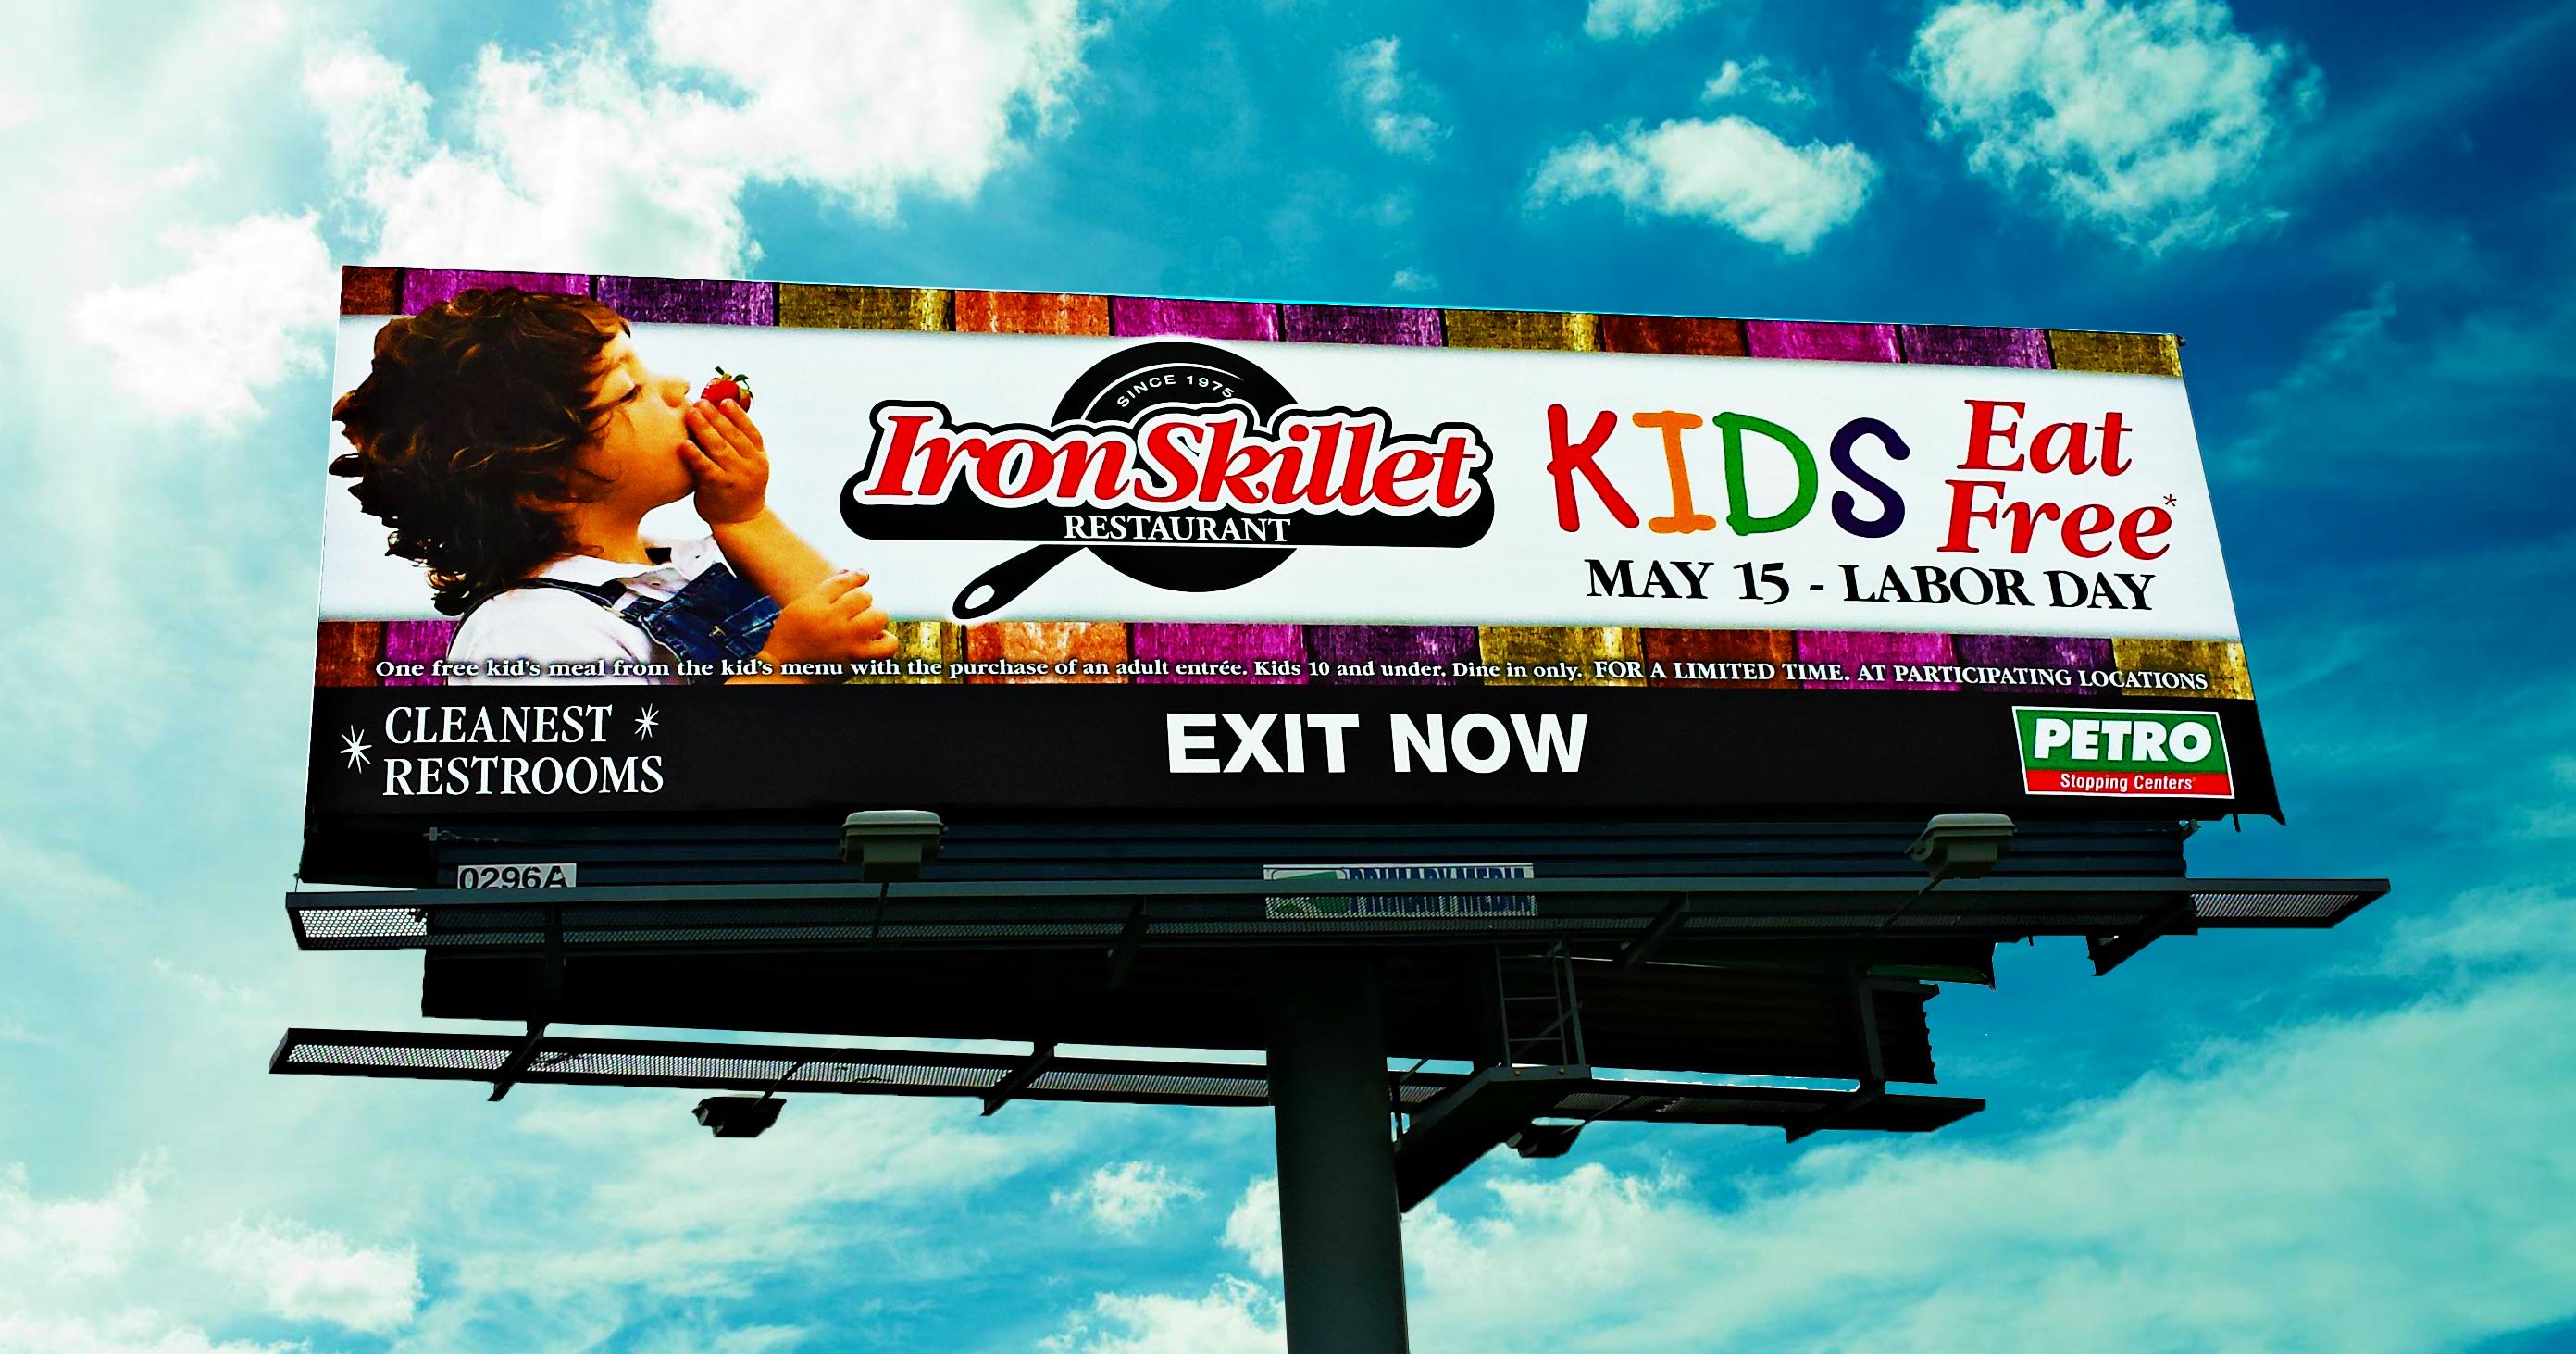 Winstar casino billboard